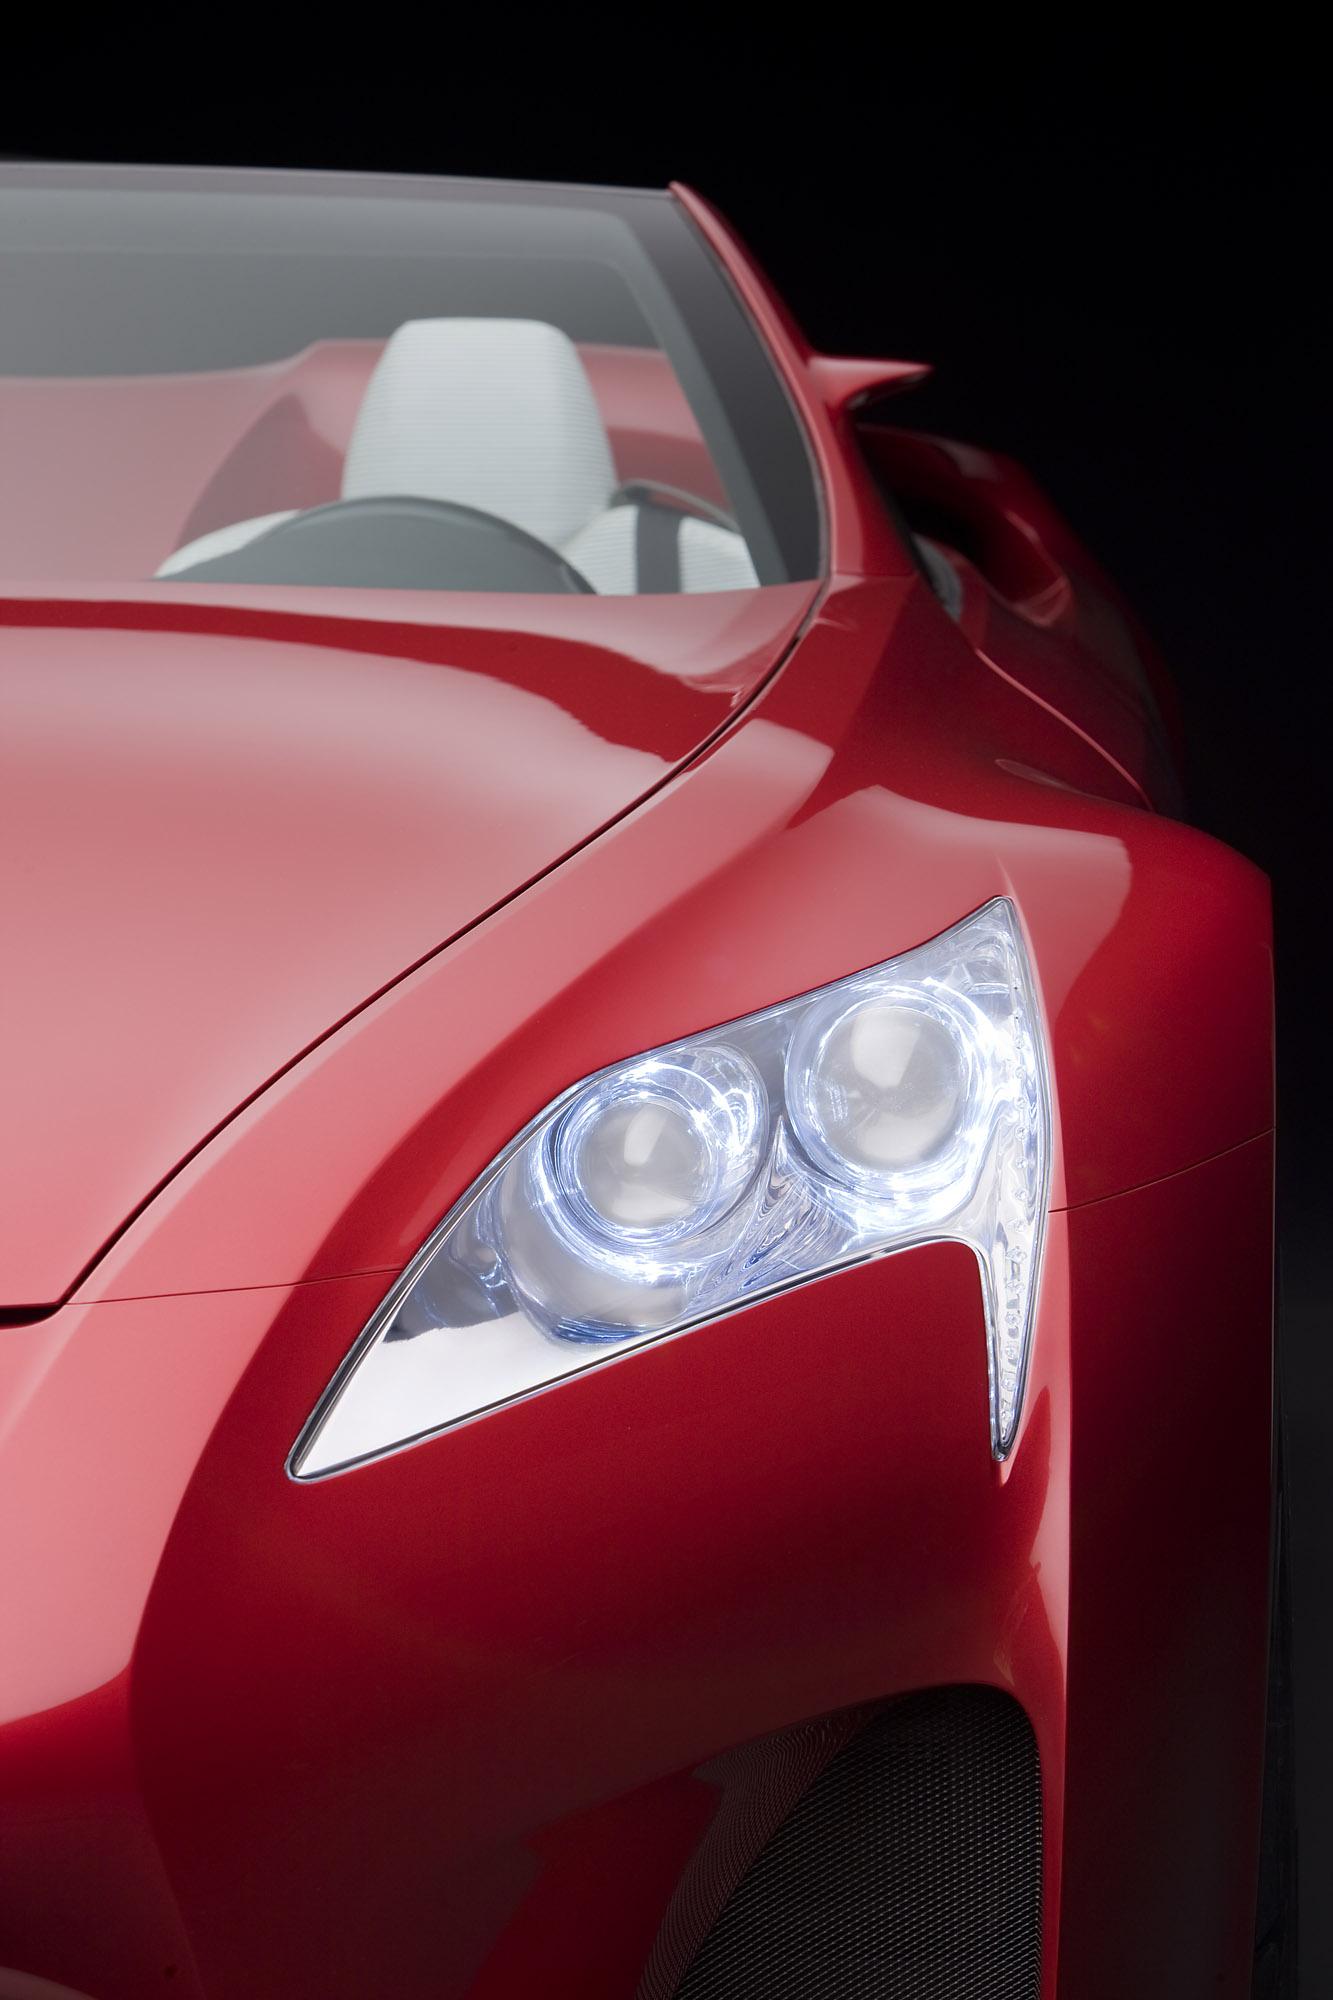 https://www.carsinvasion.com/gallery/2008-lexus-lf-a-roadster-concept/2008-lexus-lf-a-roadster-concept-12.jpg